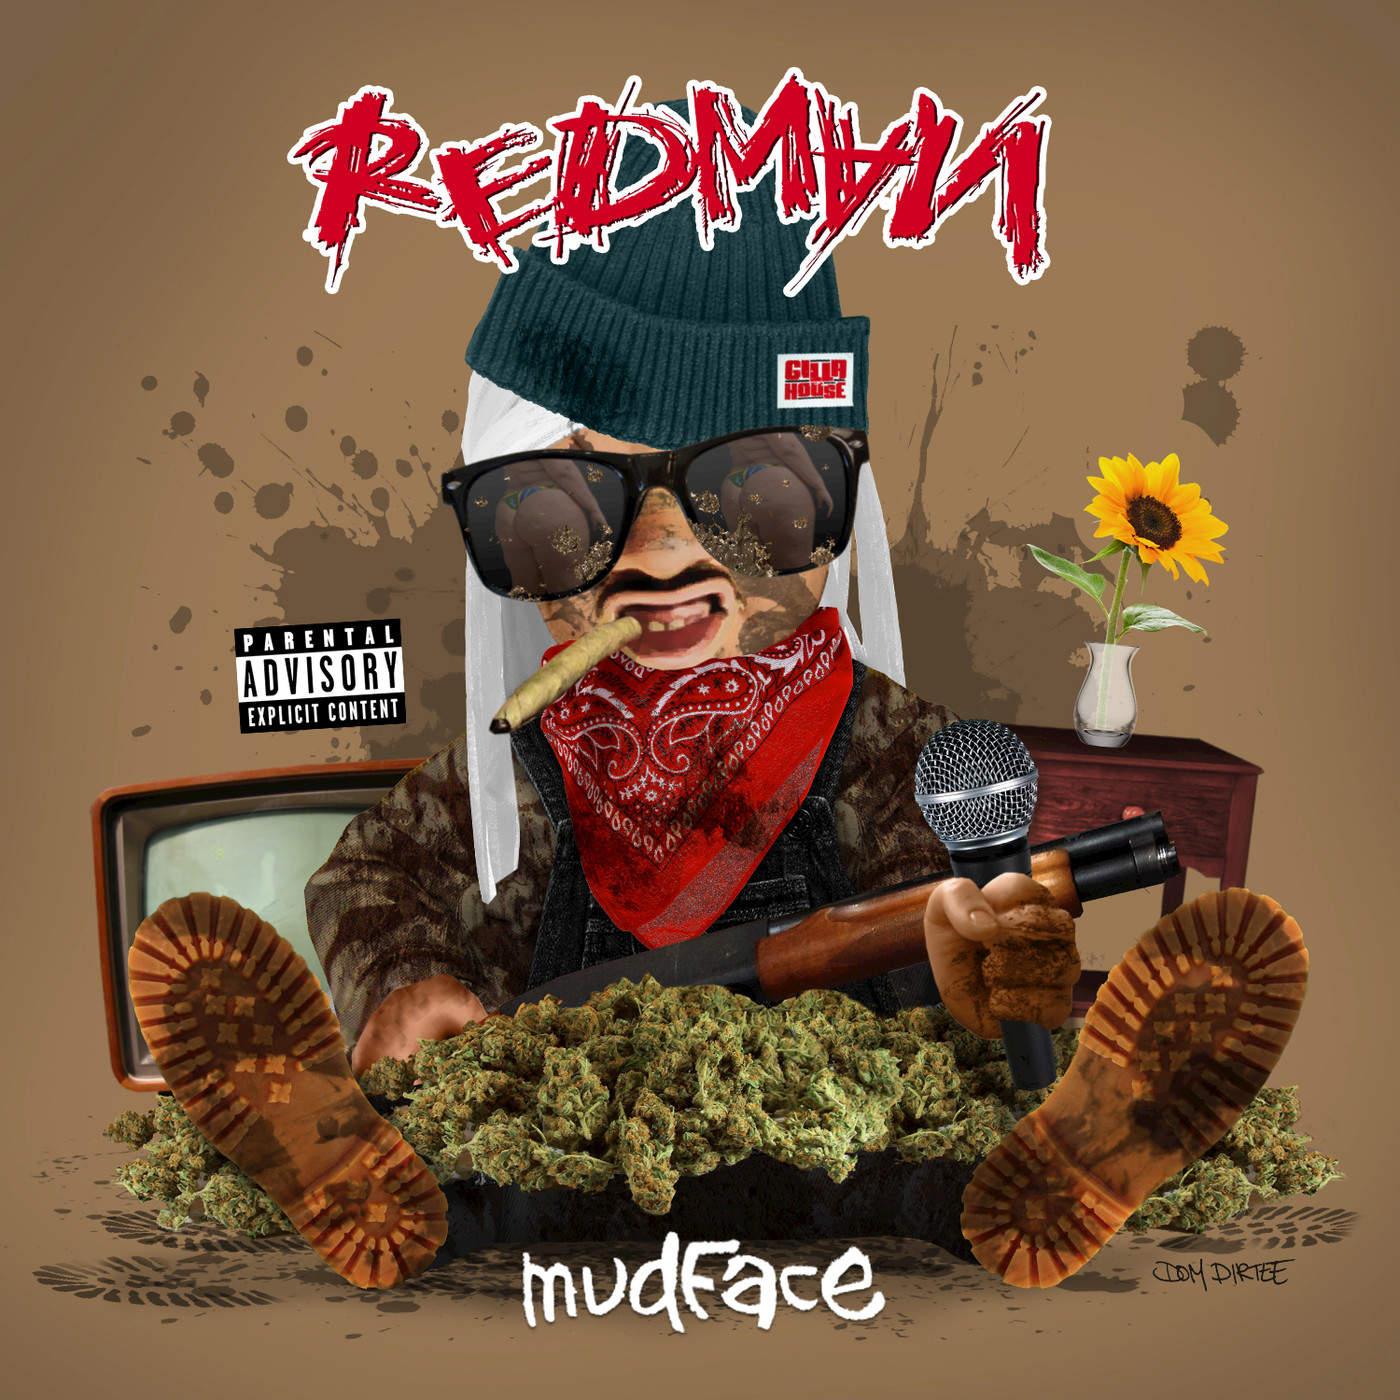 Redman - Mudface Cover